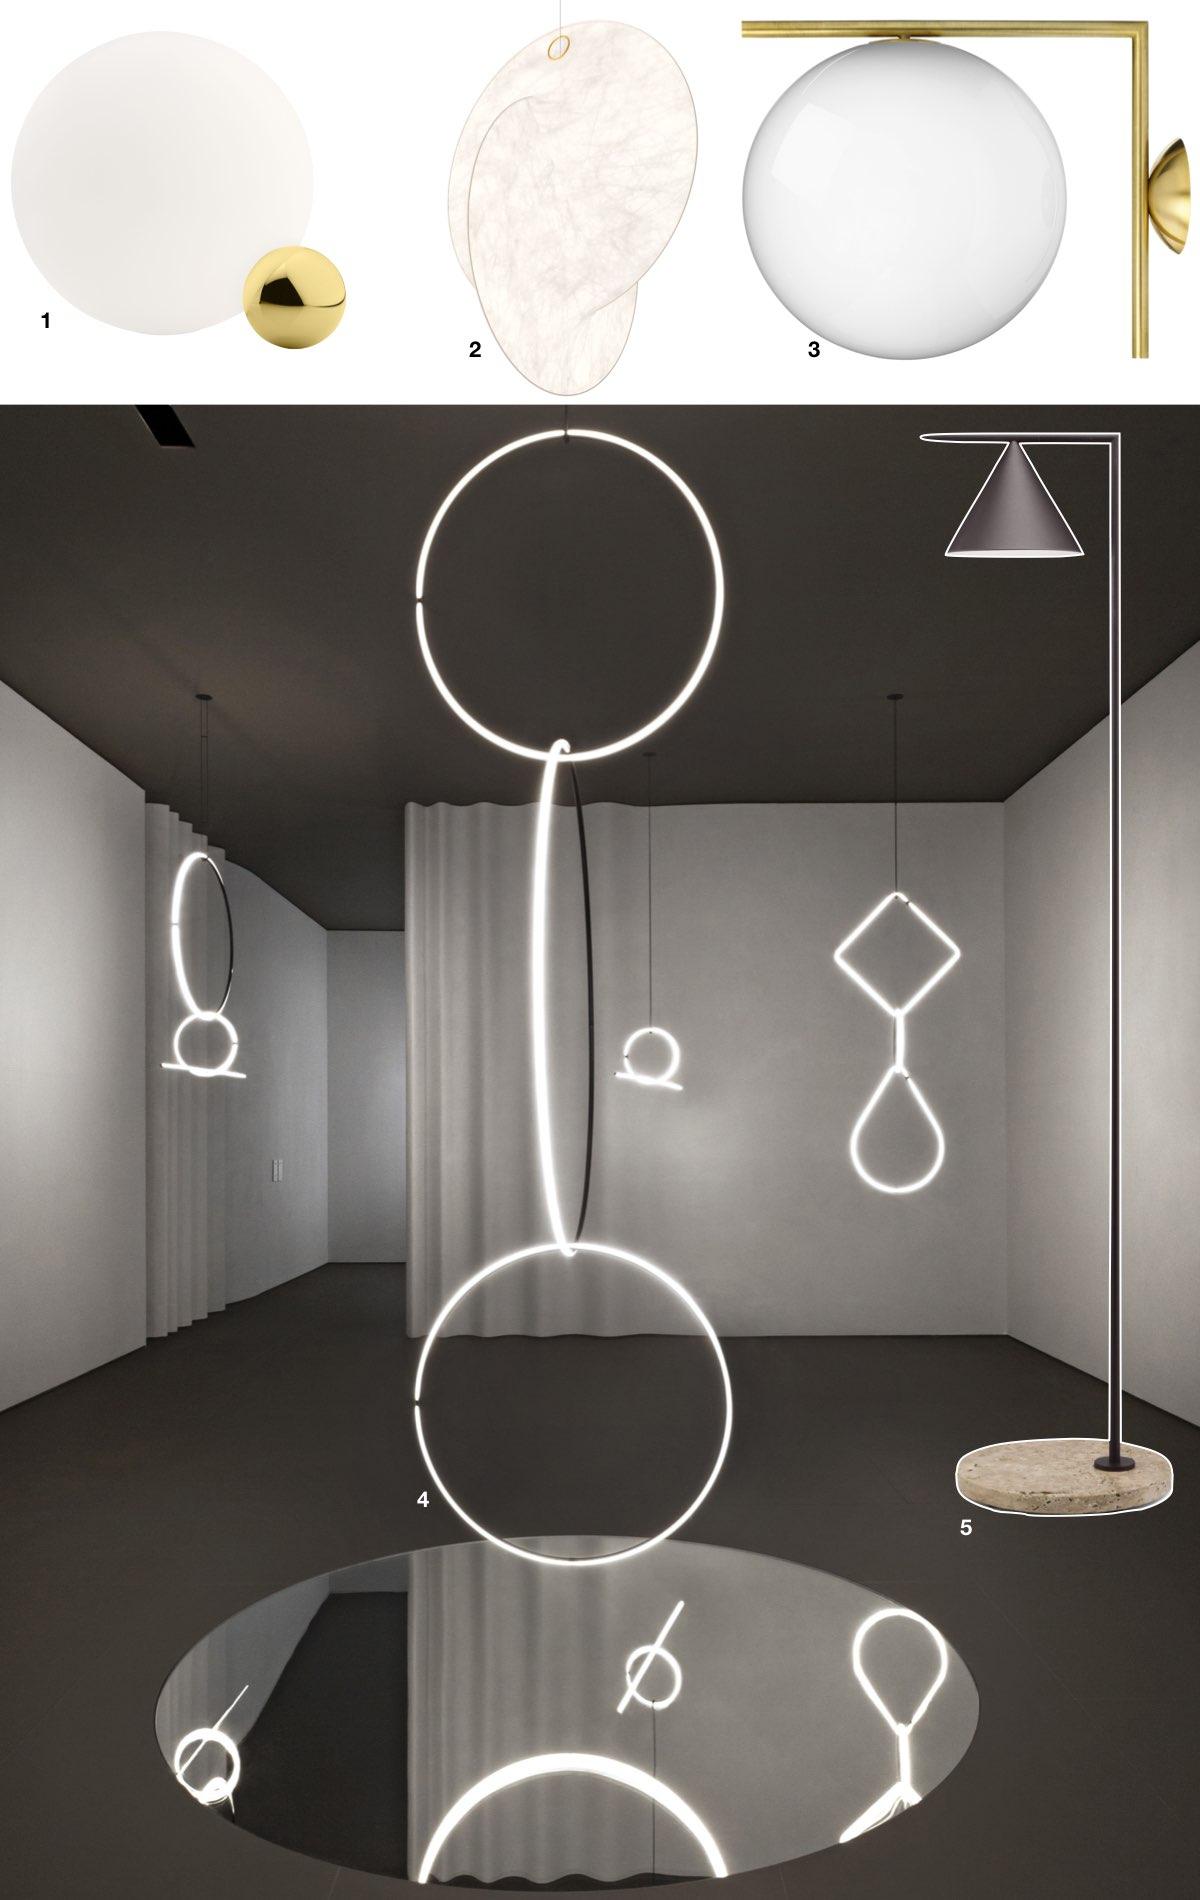 luminaire design michael Anastassiades icone iconique lampe moderne collection